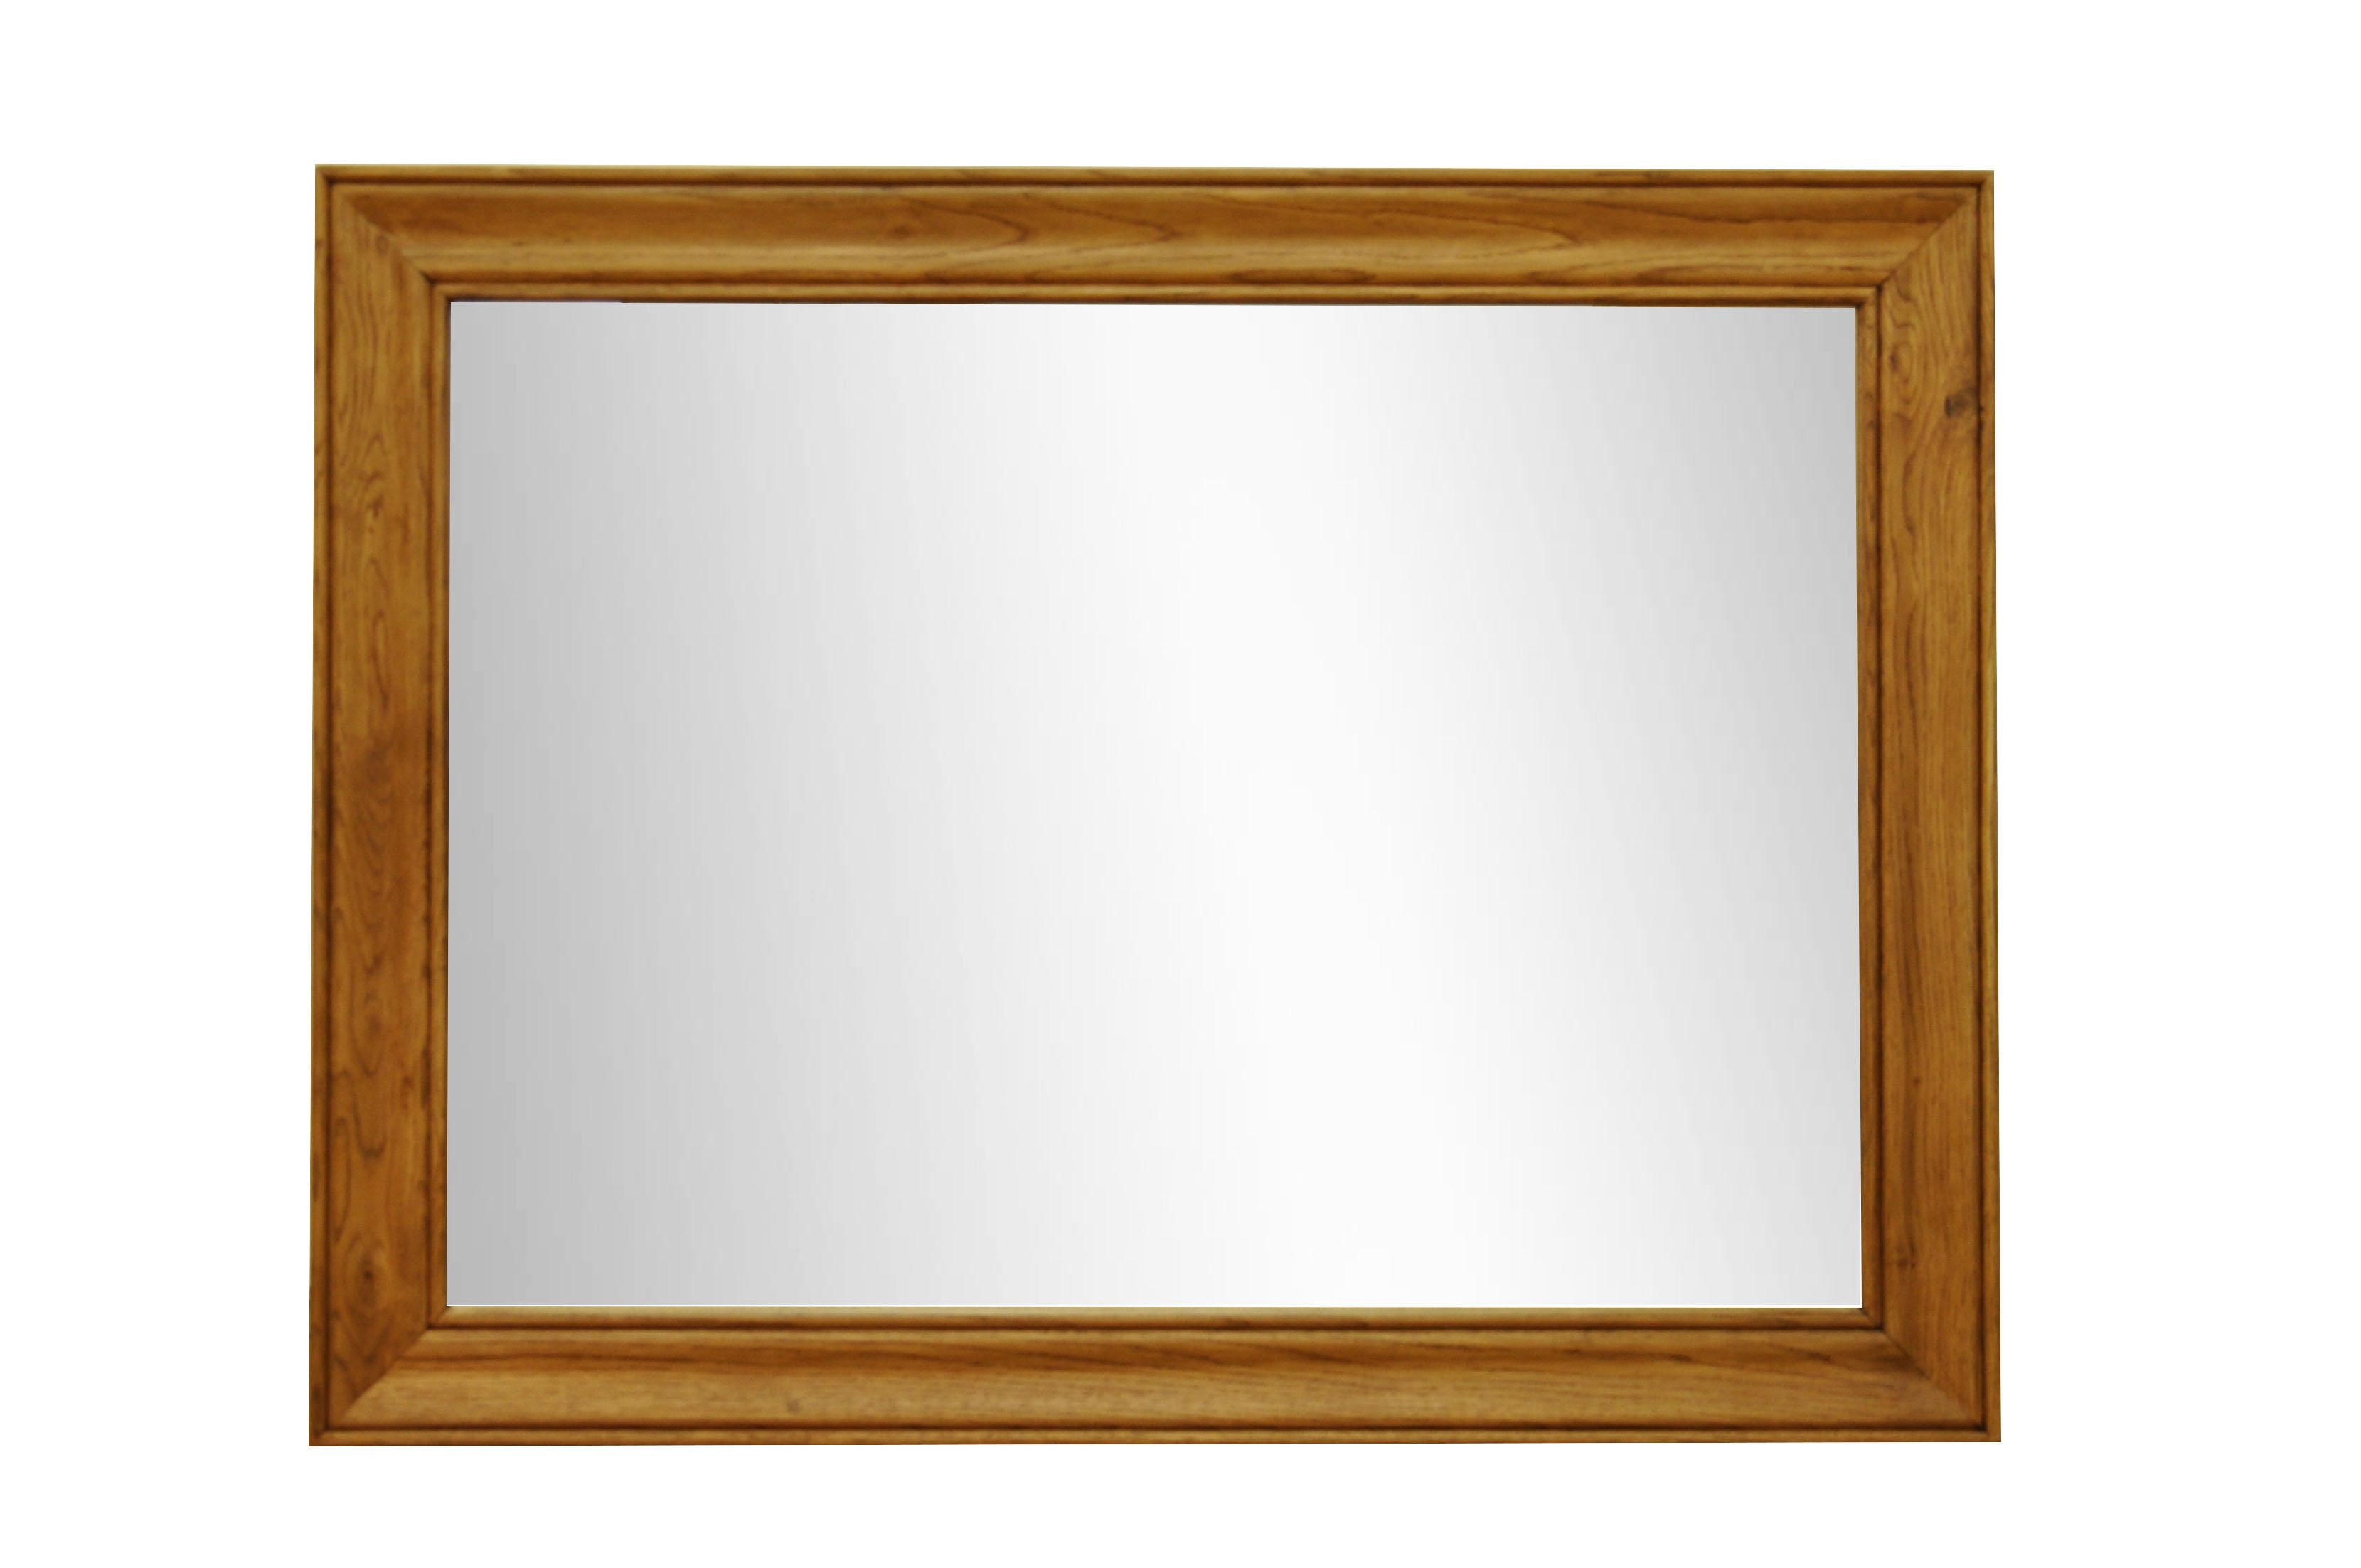 Image of Harrogate Large Wall Mirror